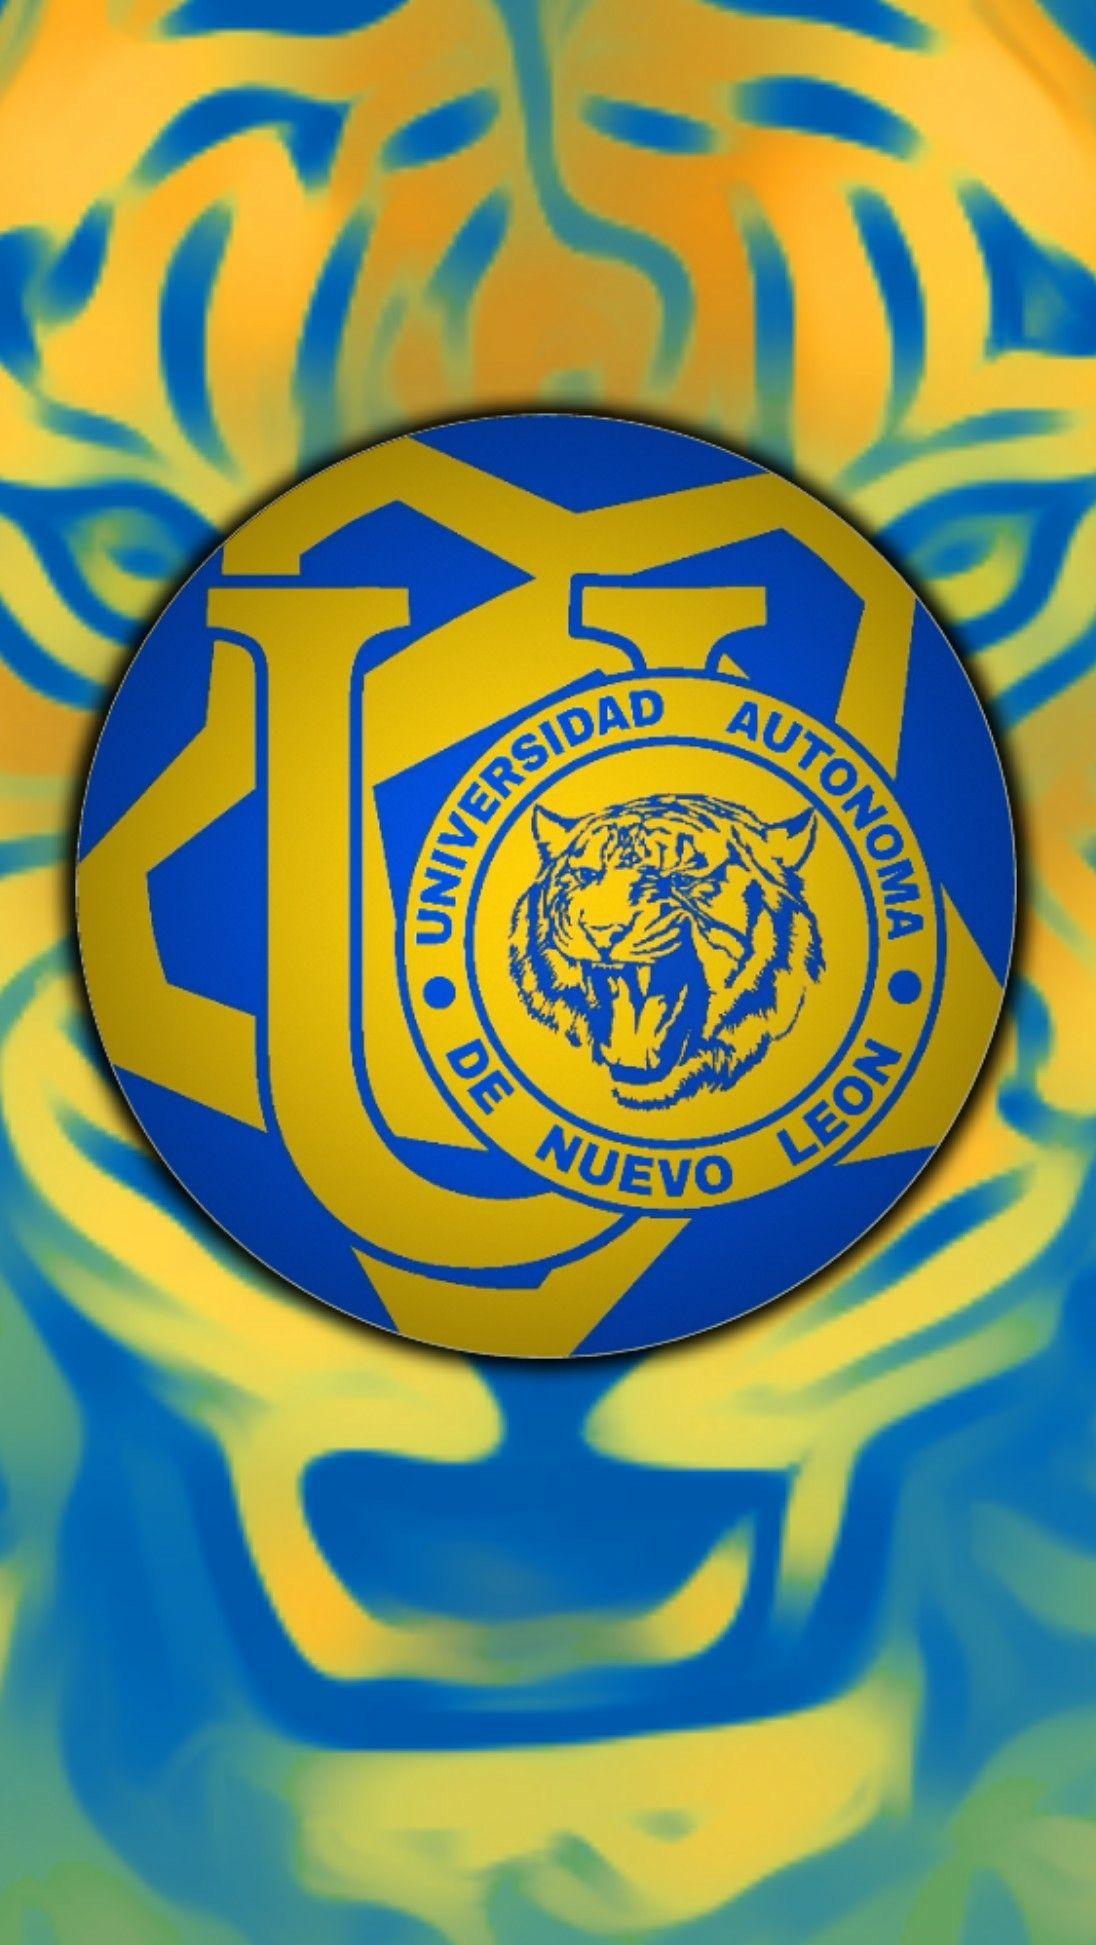 Tigres UANL Escudo 70's Fondo de Pantalla Tigres uanl